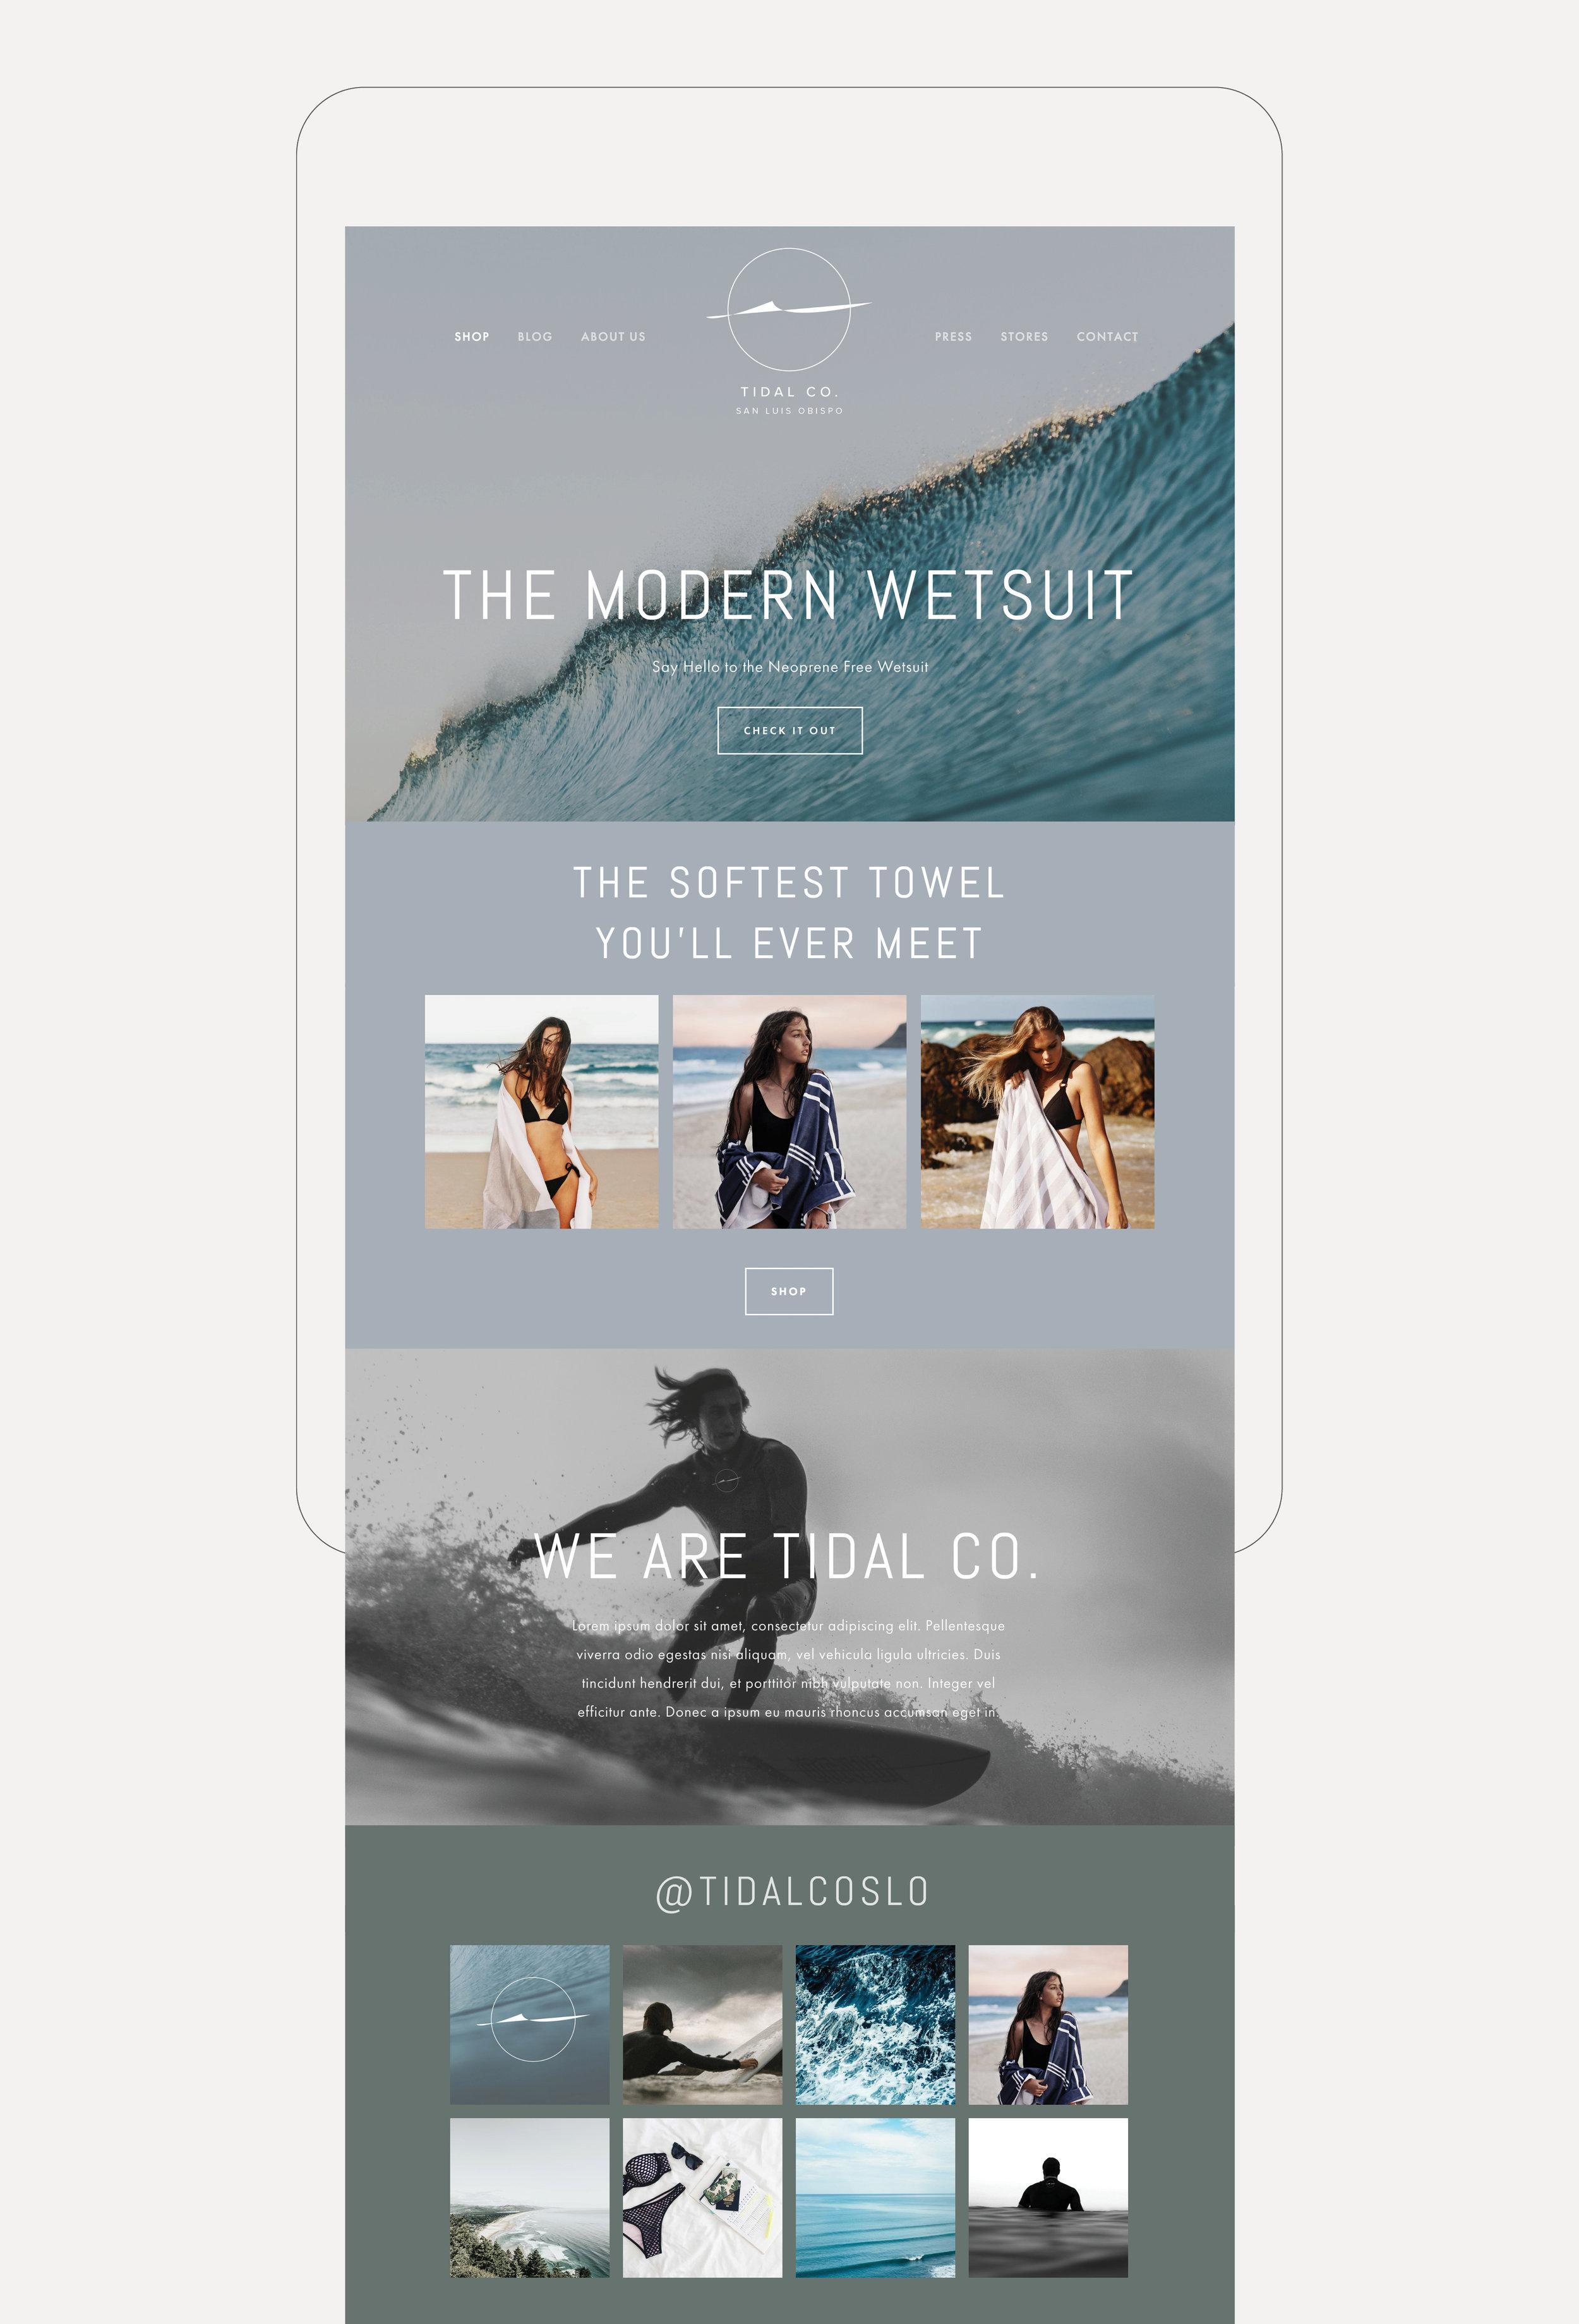 RileyYahrCreativeStudio_TidalCo_iPadMockup2.jpg